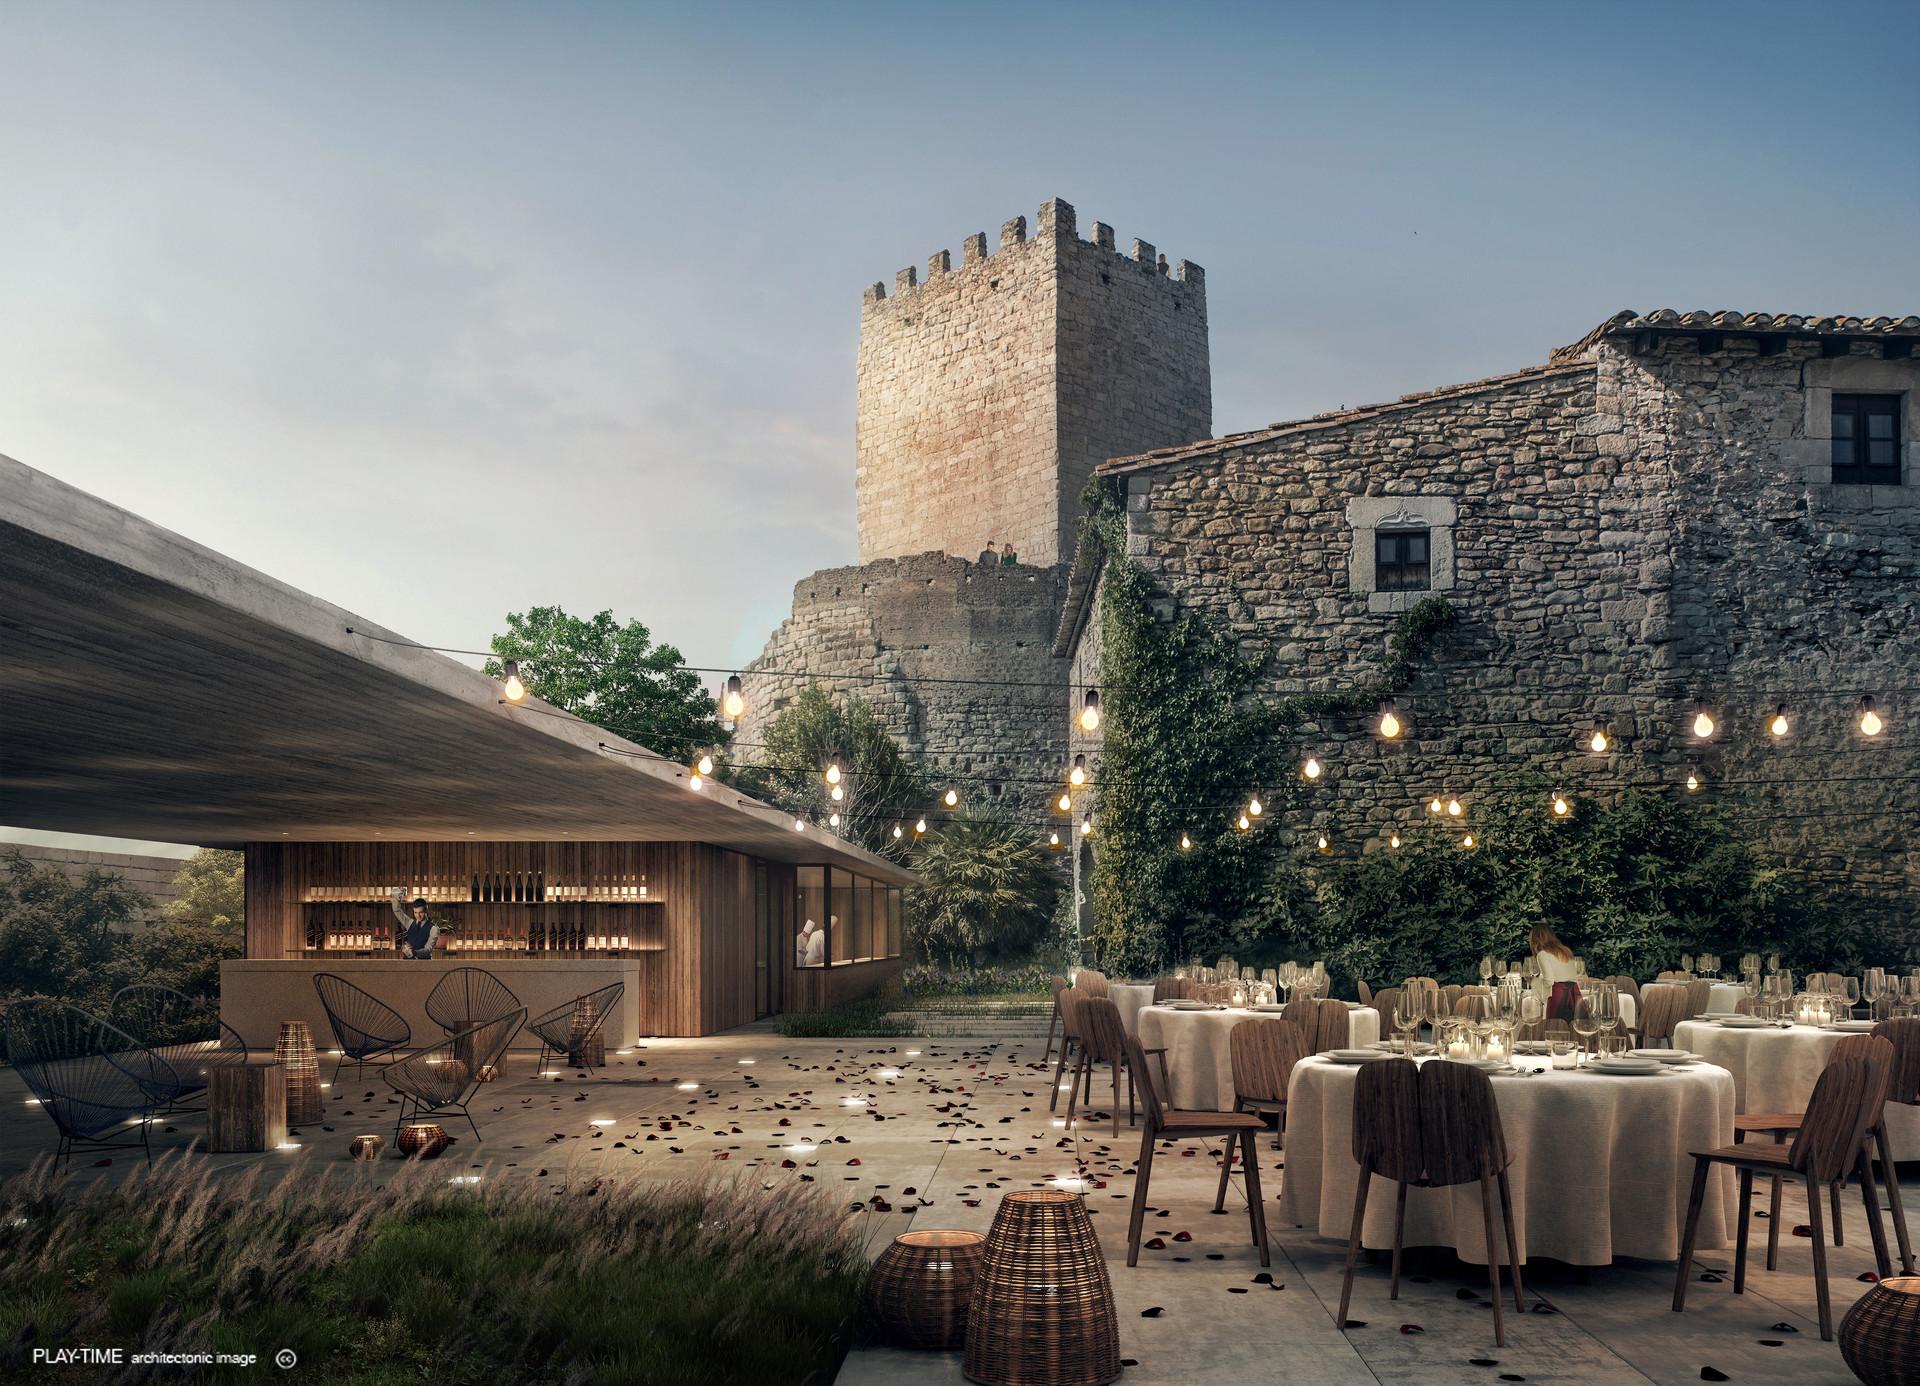 Play time architectonic image mesura rehabilitacio del castell de peratellada 04